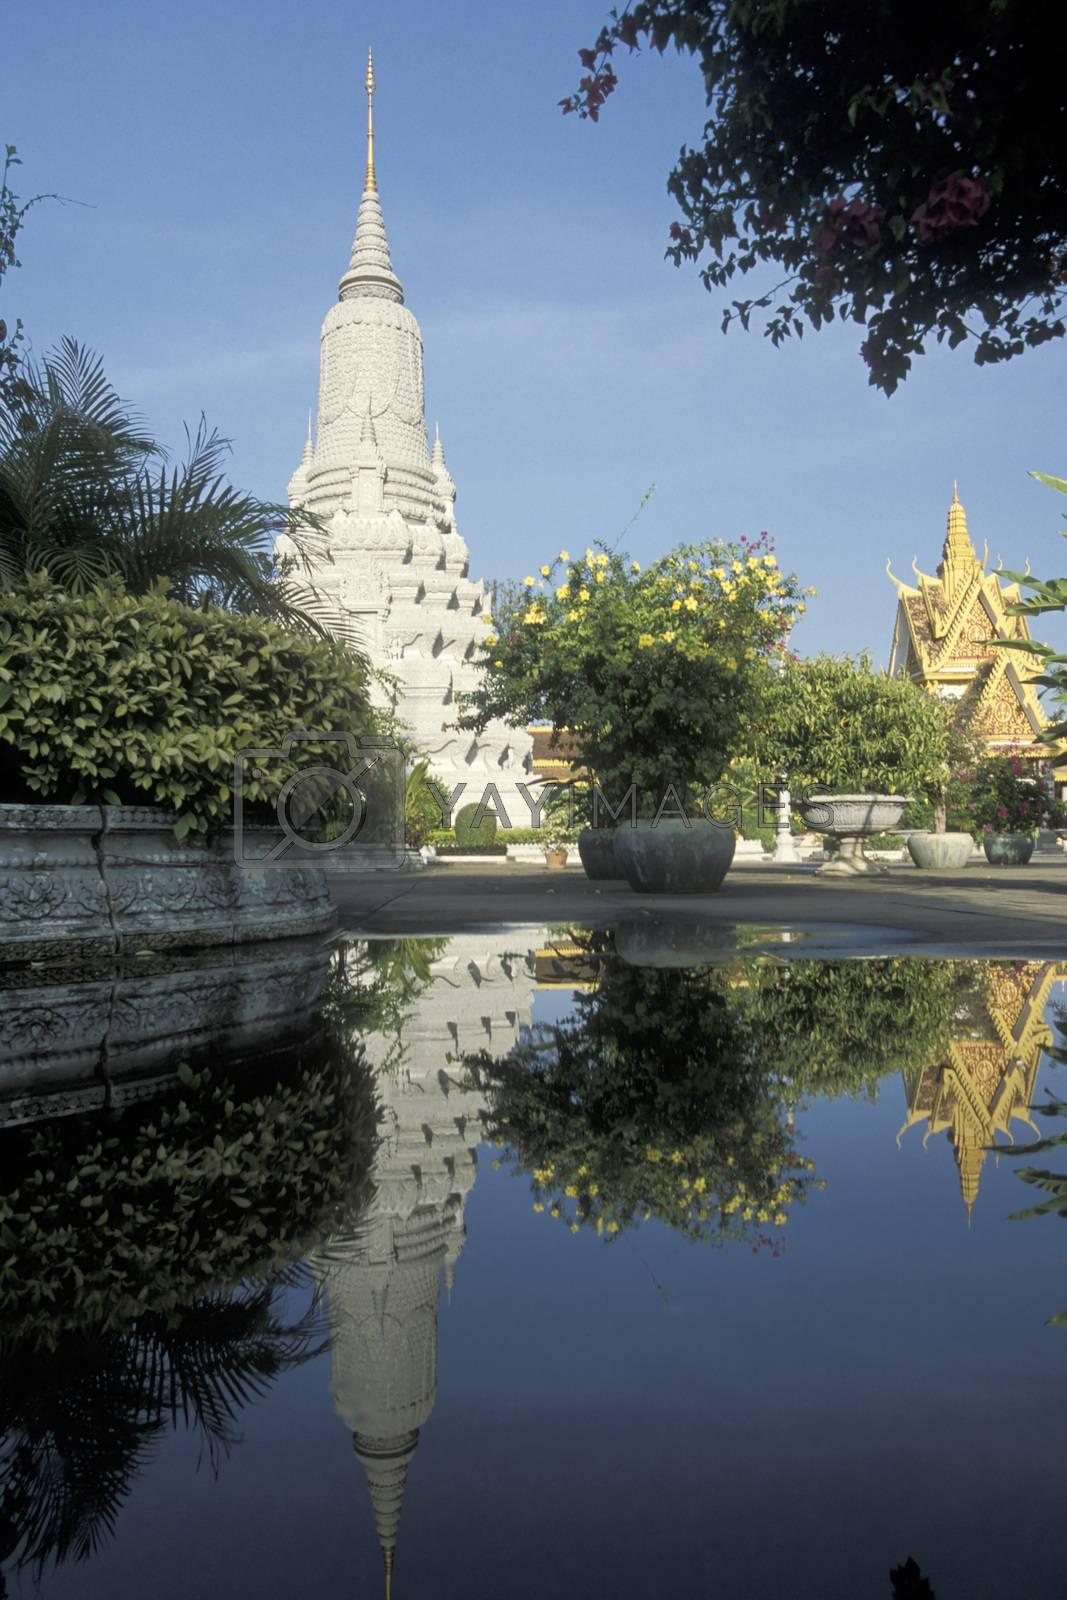 the Wat Phnom Park in the city of Phnom Penh of Cambodia.  Cambodia, Phnom Penh, February, 2001,